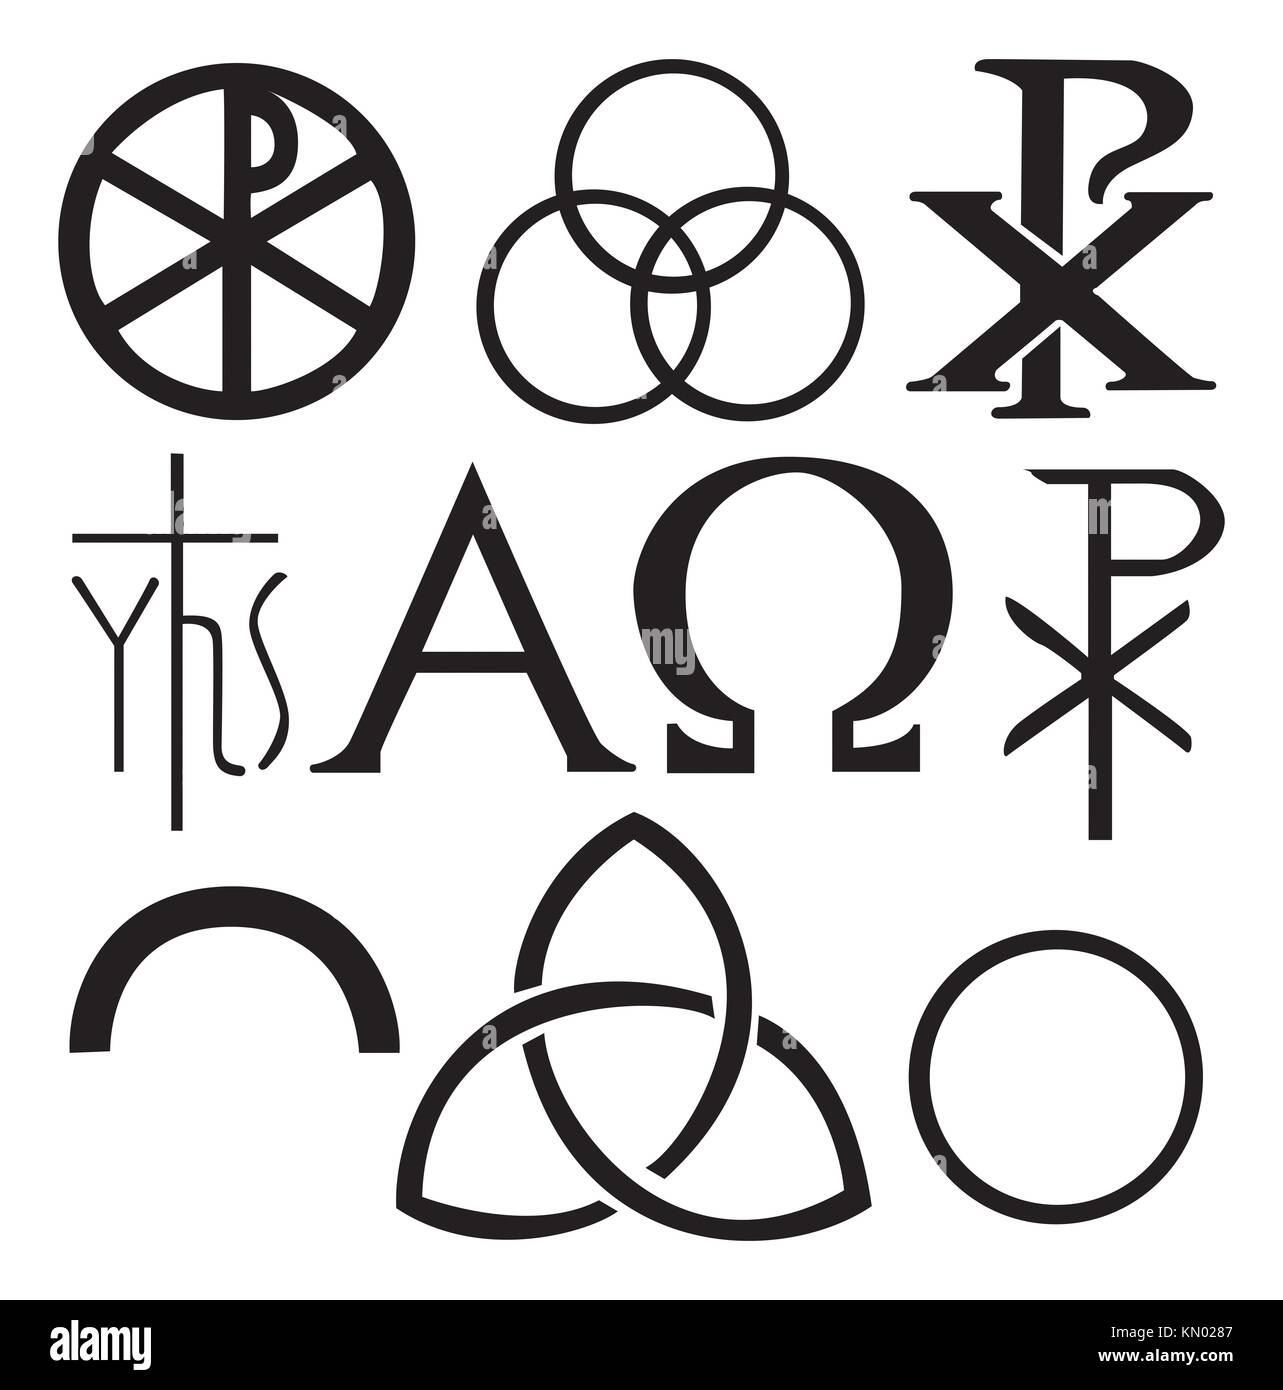 Medieval religious symbols image collections symbol and sign ideas alpha omega symbols symbol stock photos alpha omega symbols set of christian symbols stock image buycottarizona biocorpaavc